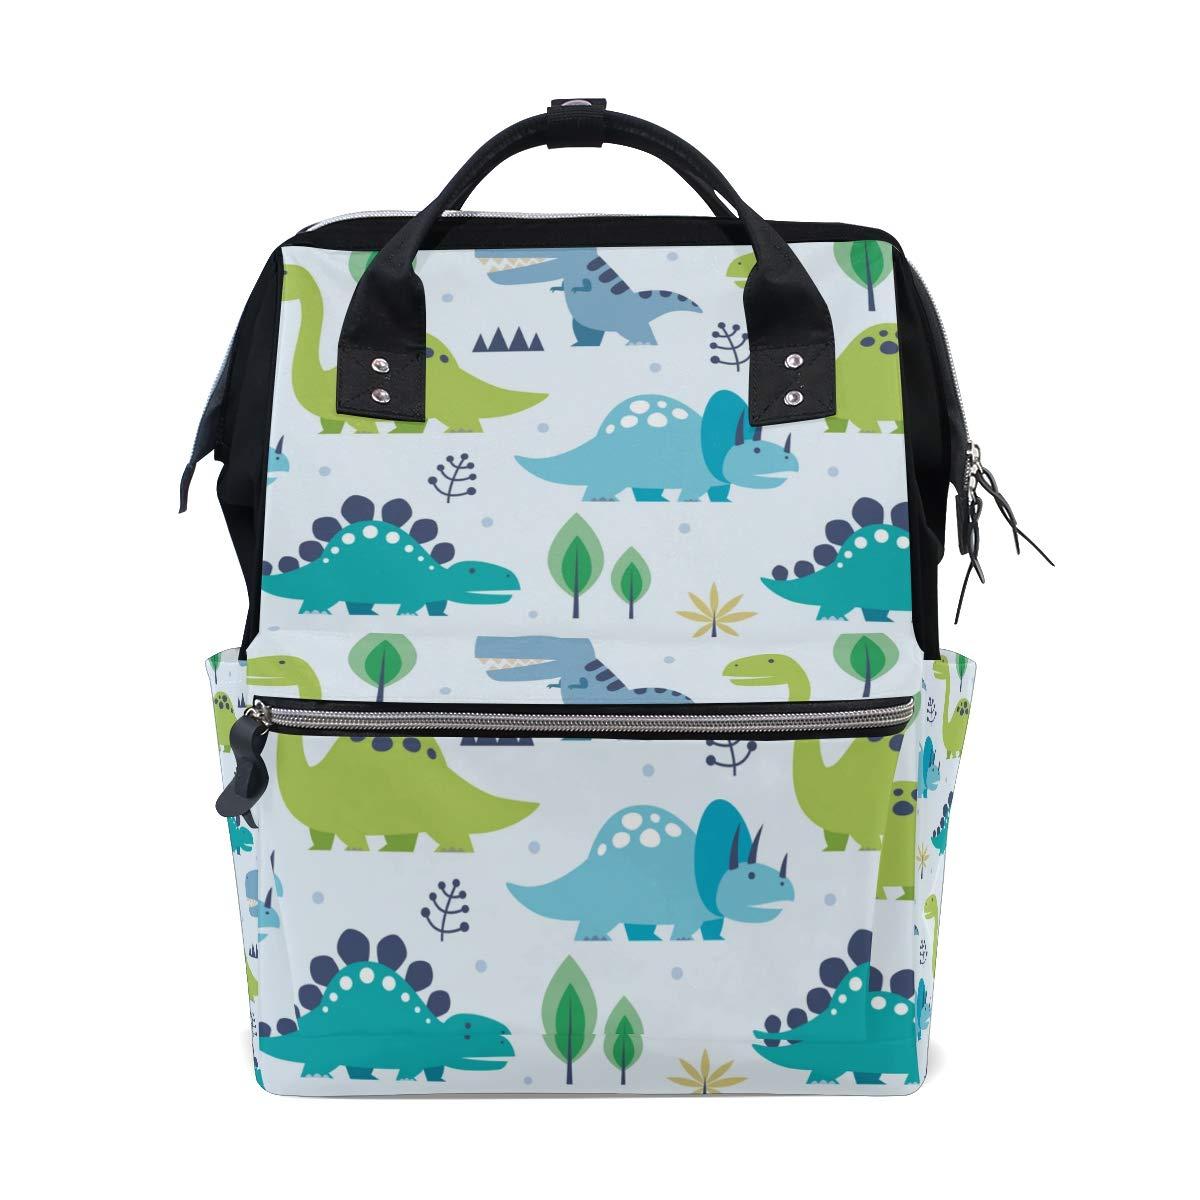 A Seed Backpack Baby Diaper Bag Dinosaurs Blue for Girls Women Tote Daypack Bookbag